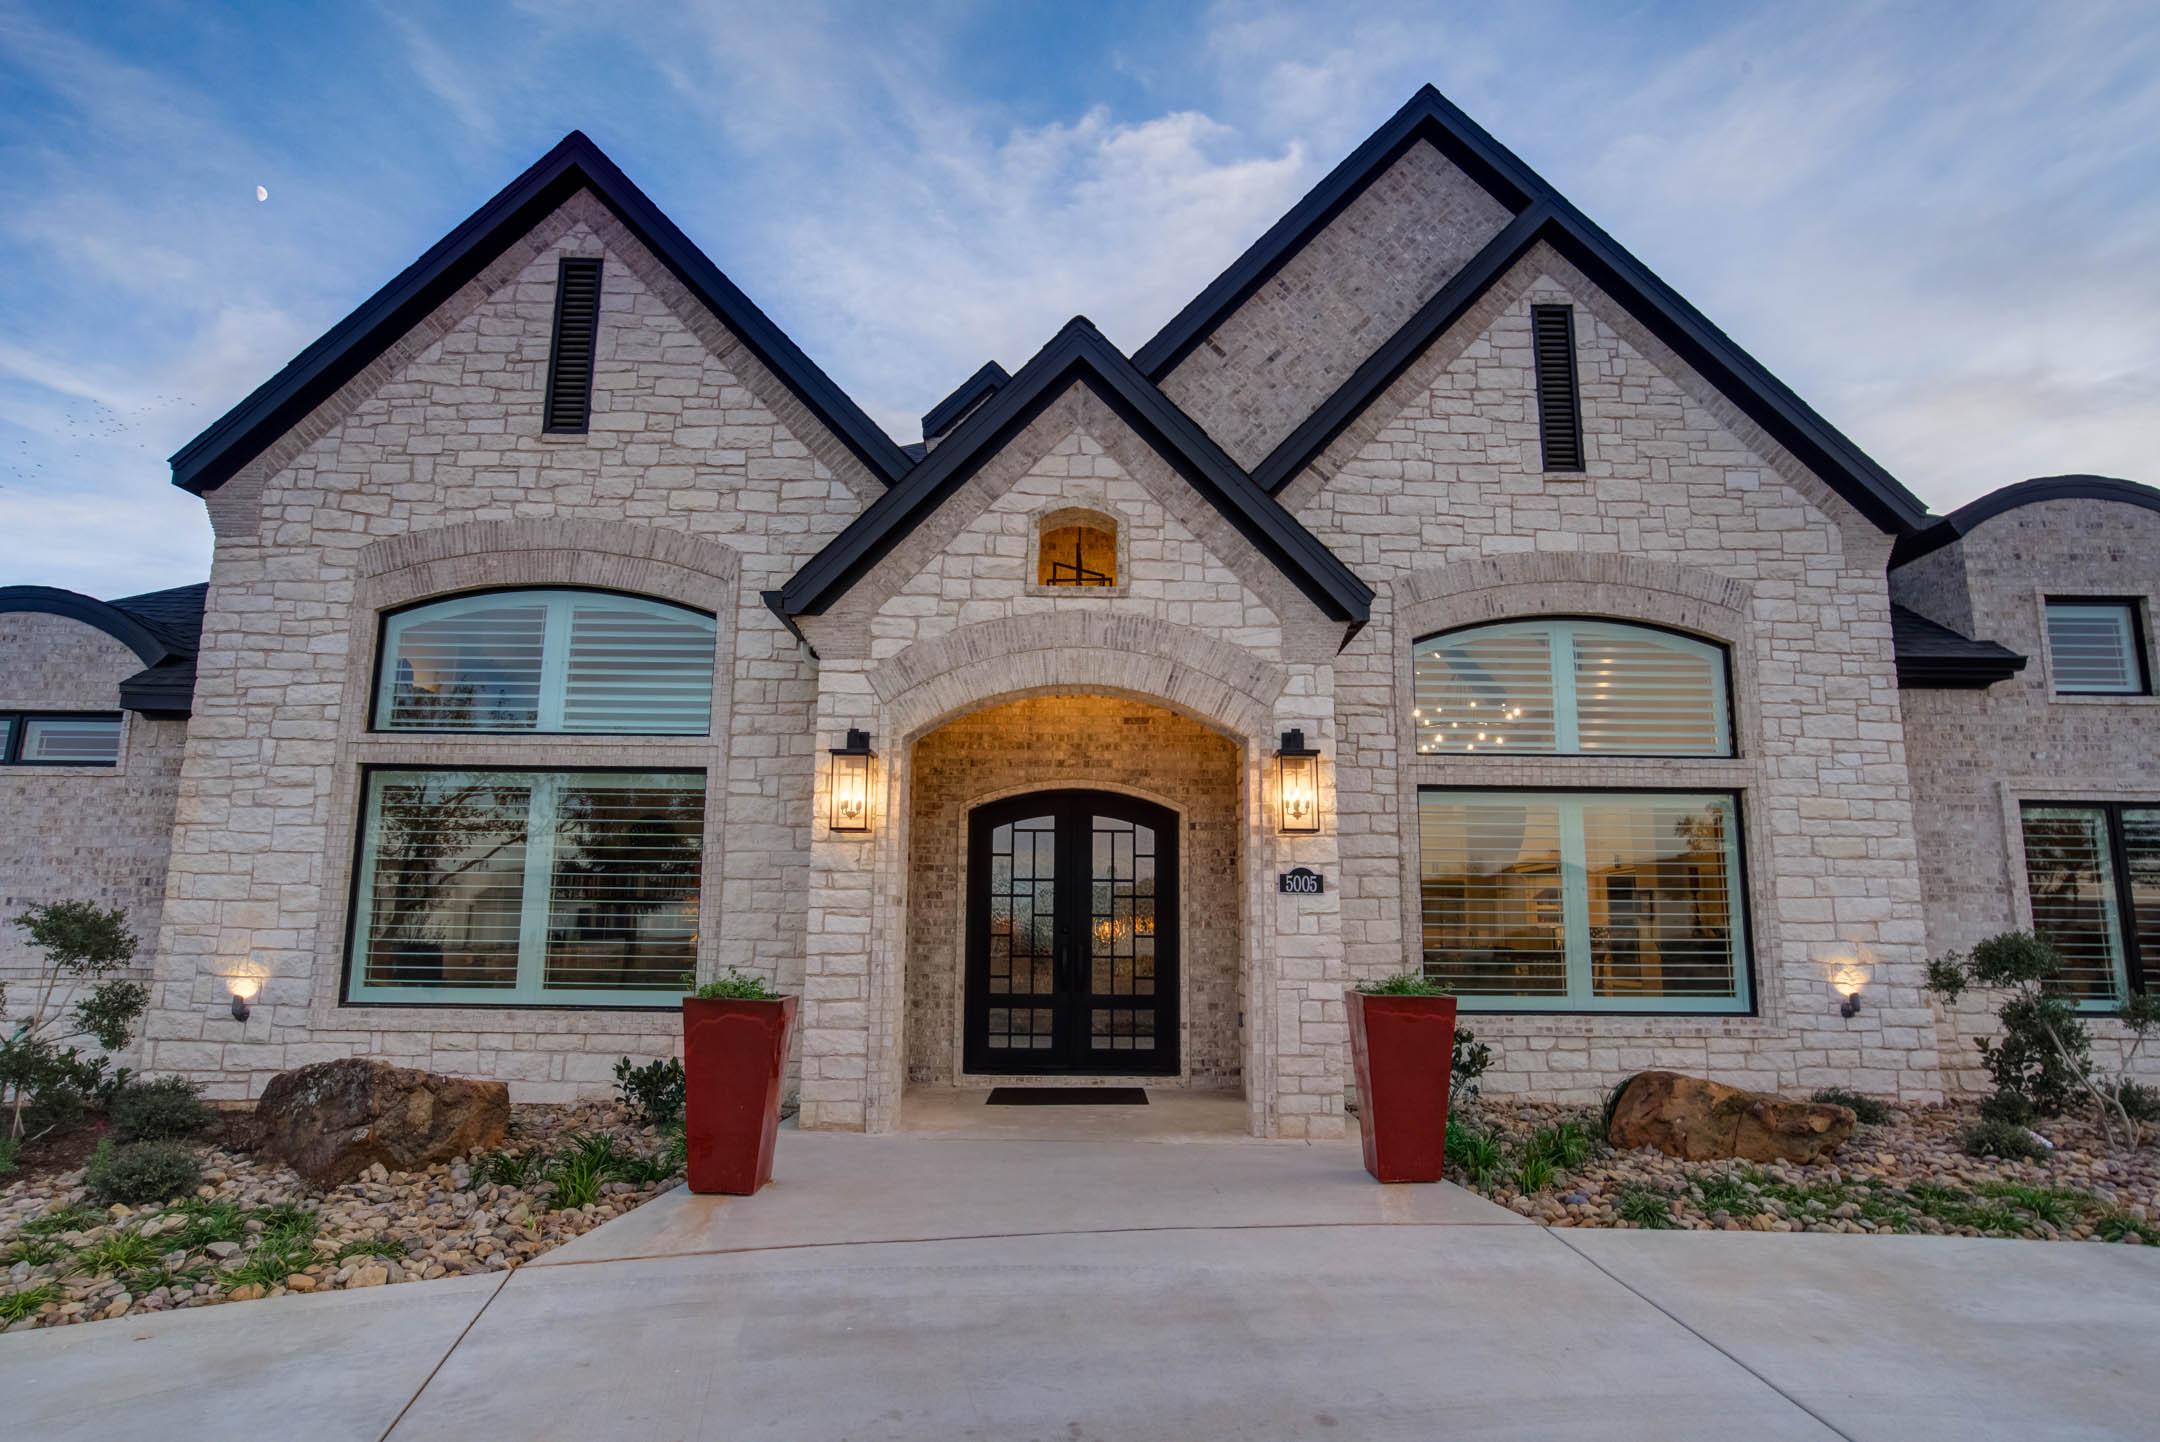 Alternate view of beautiful custom home exterior built in Lubbock, Texas.